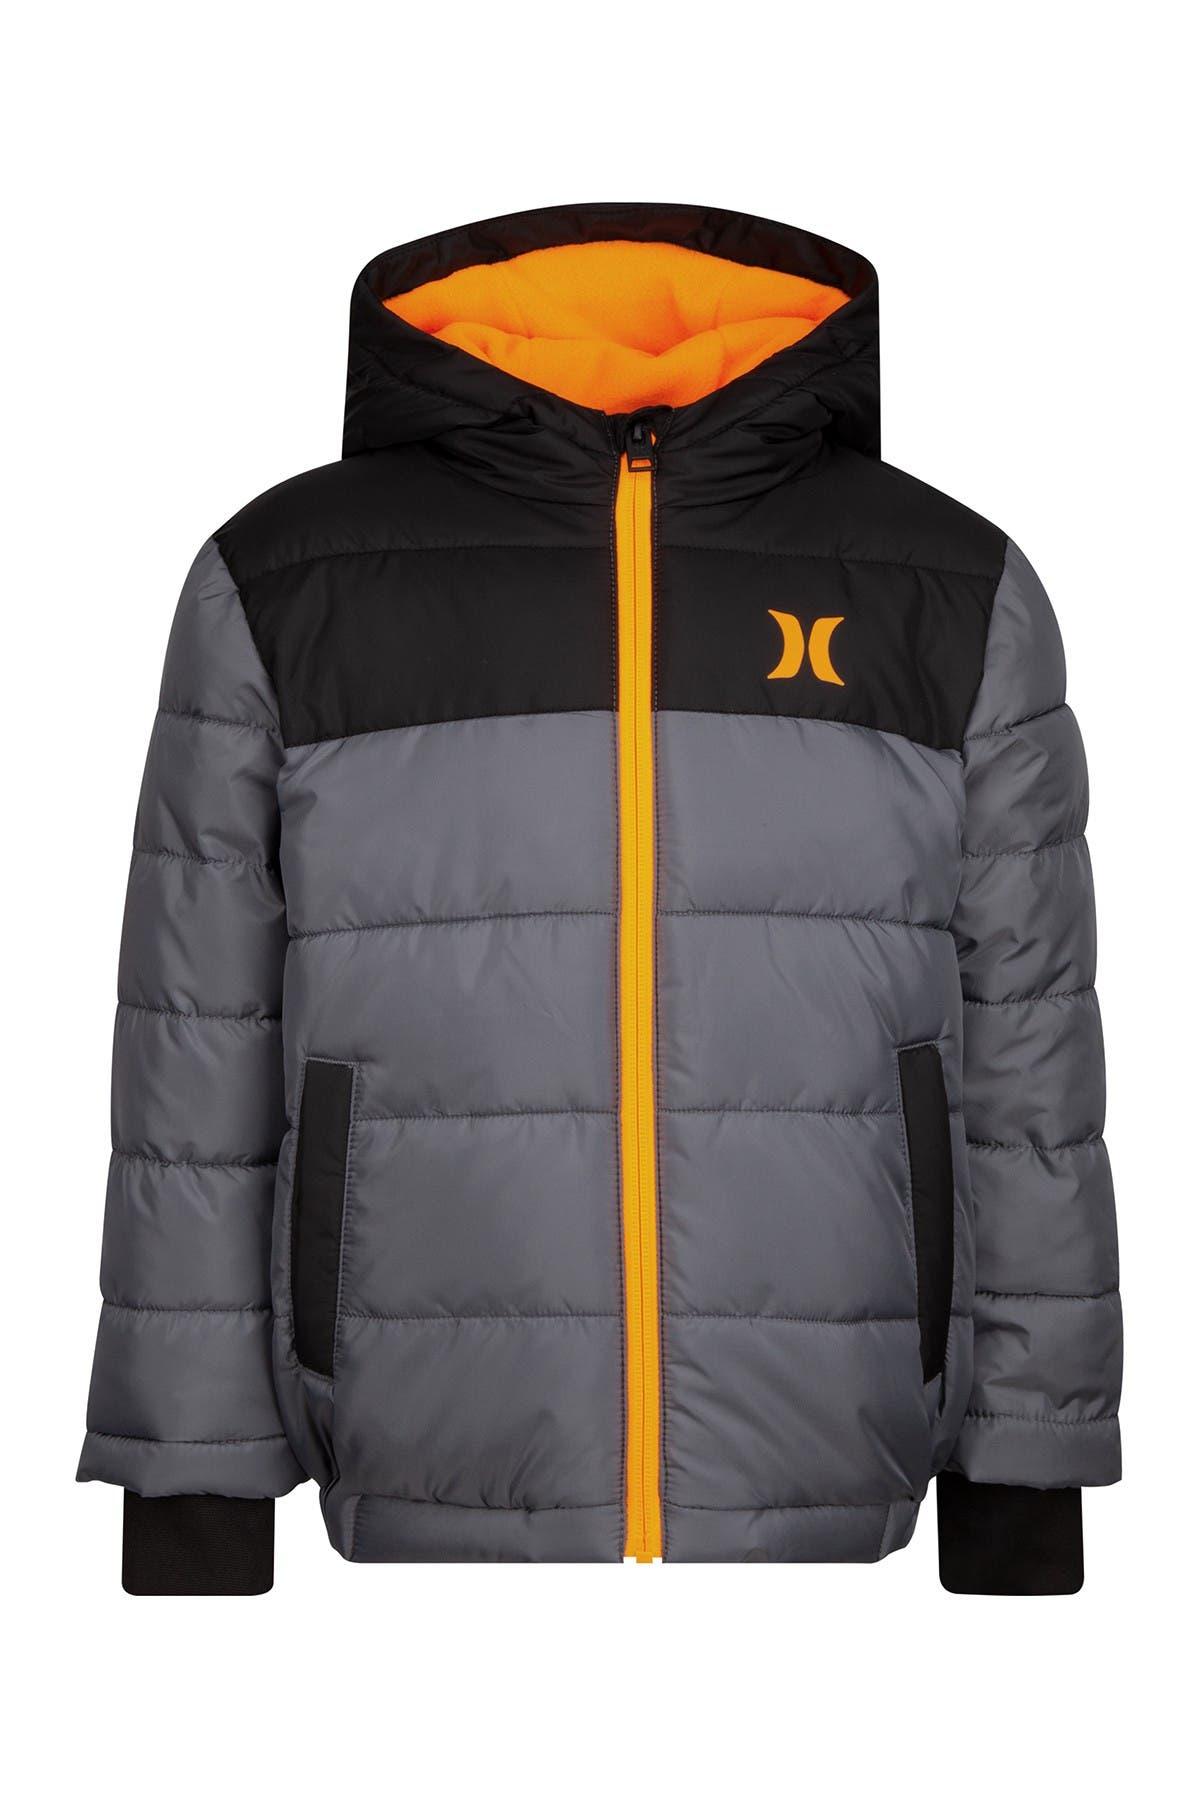 Image of Hurley Summit Puffer Jacket